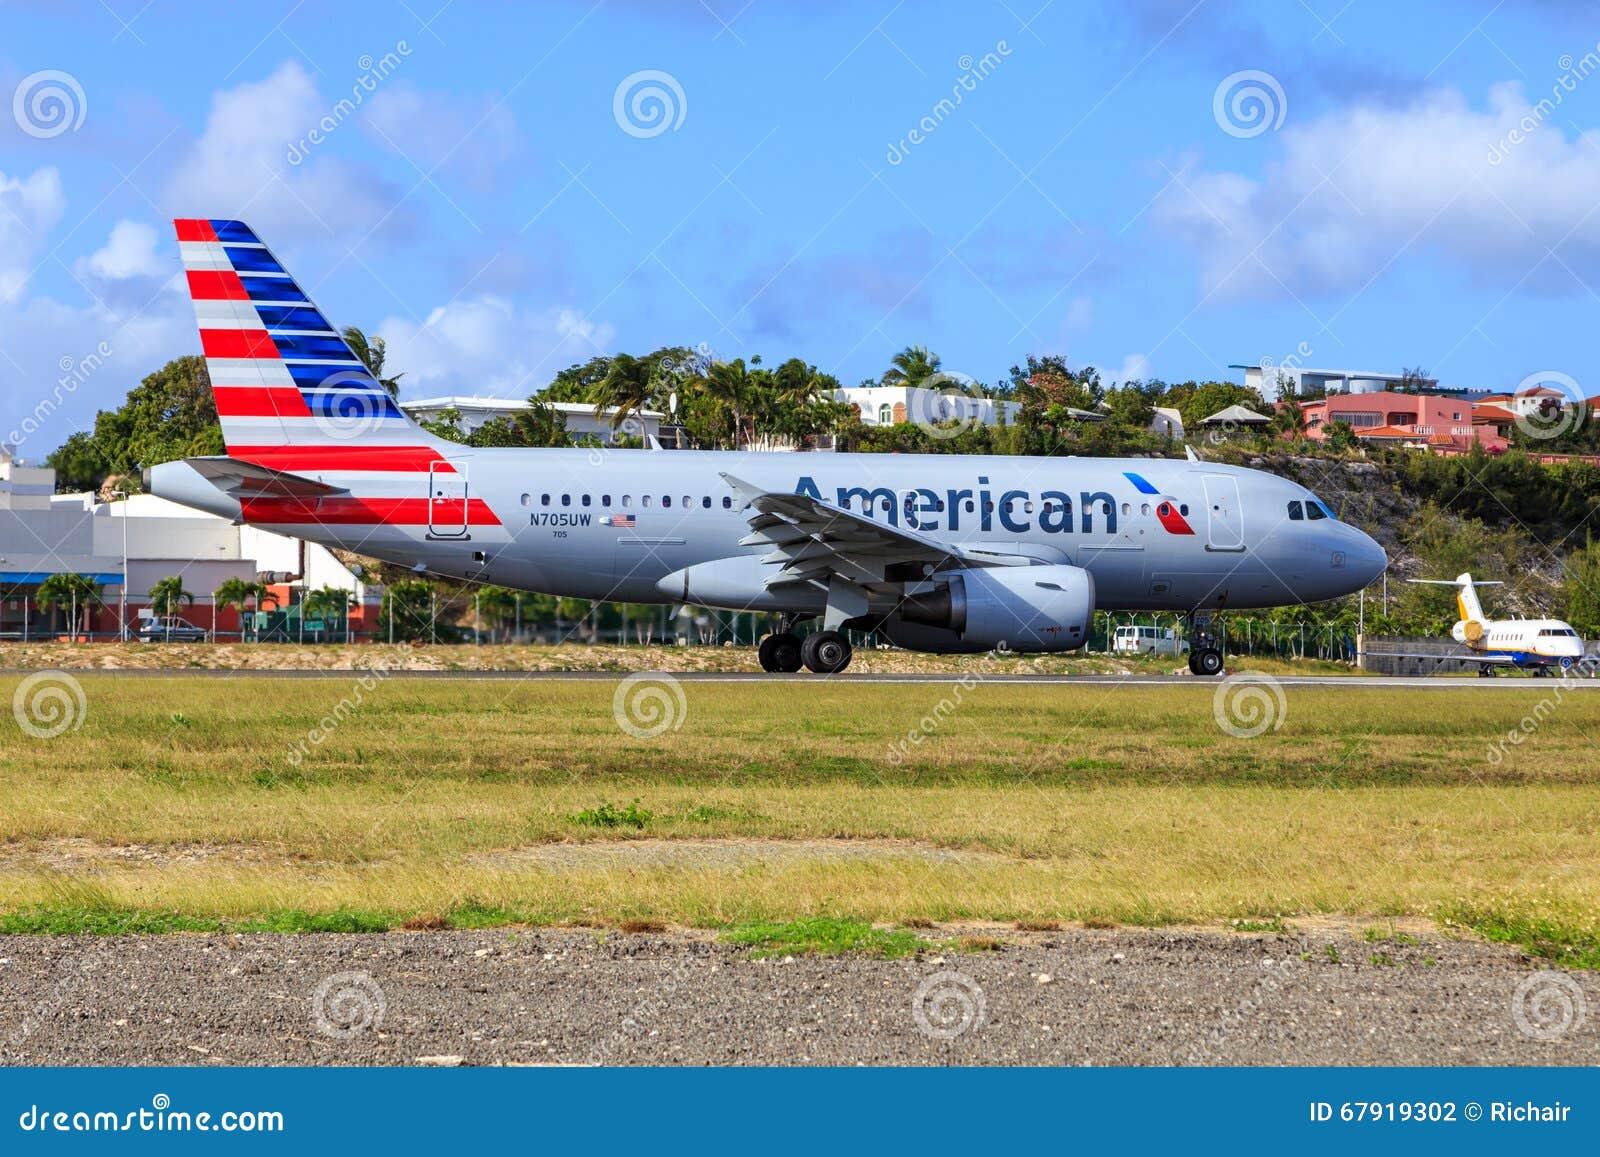 American airlines st maarten phone number